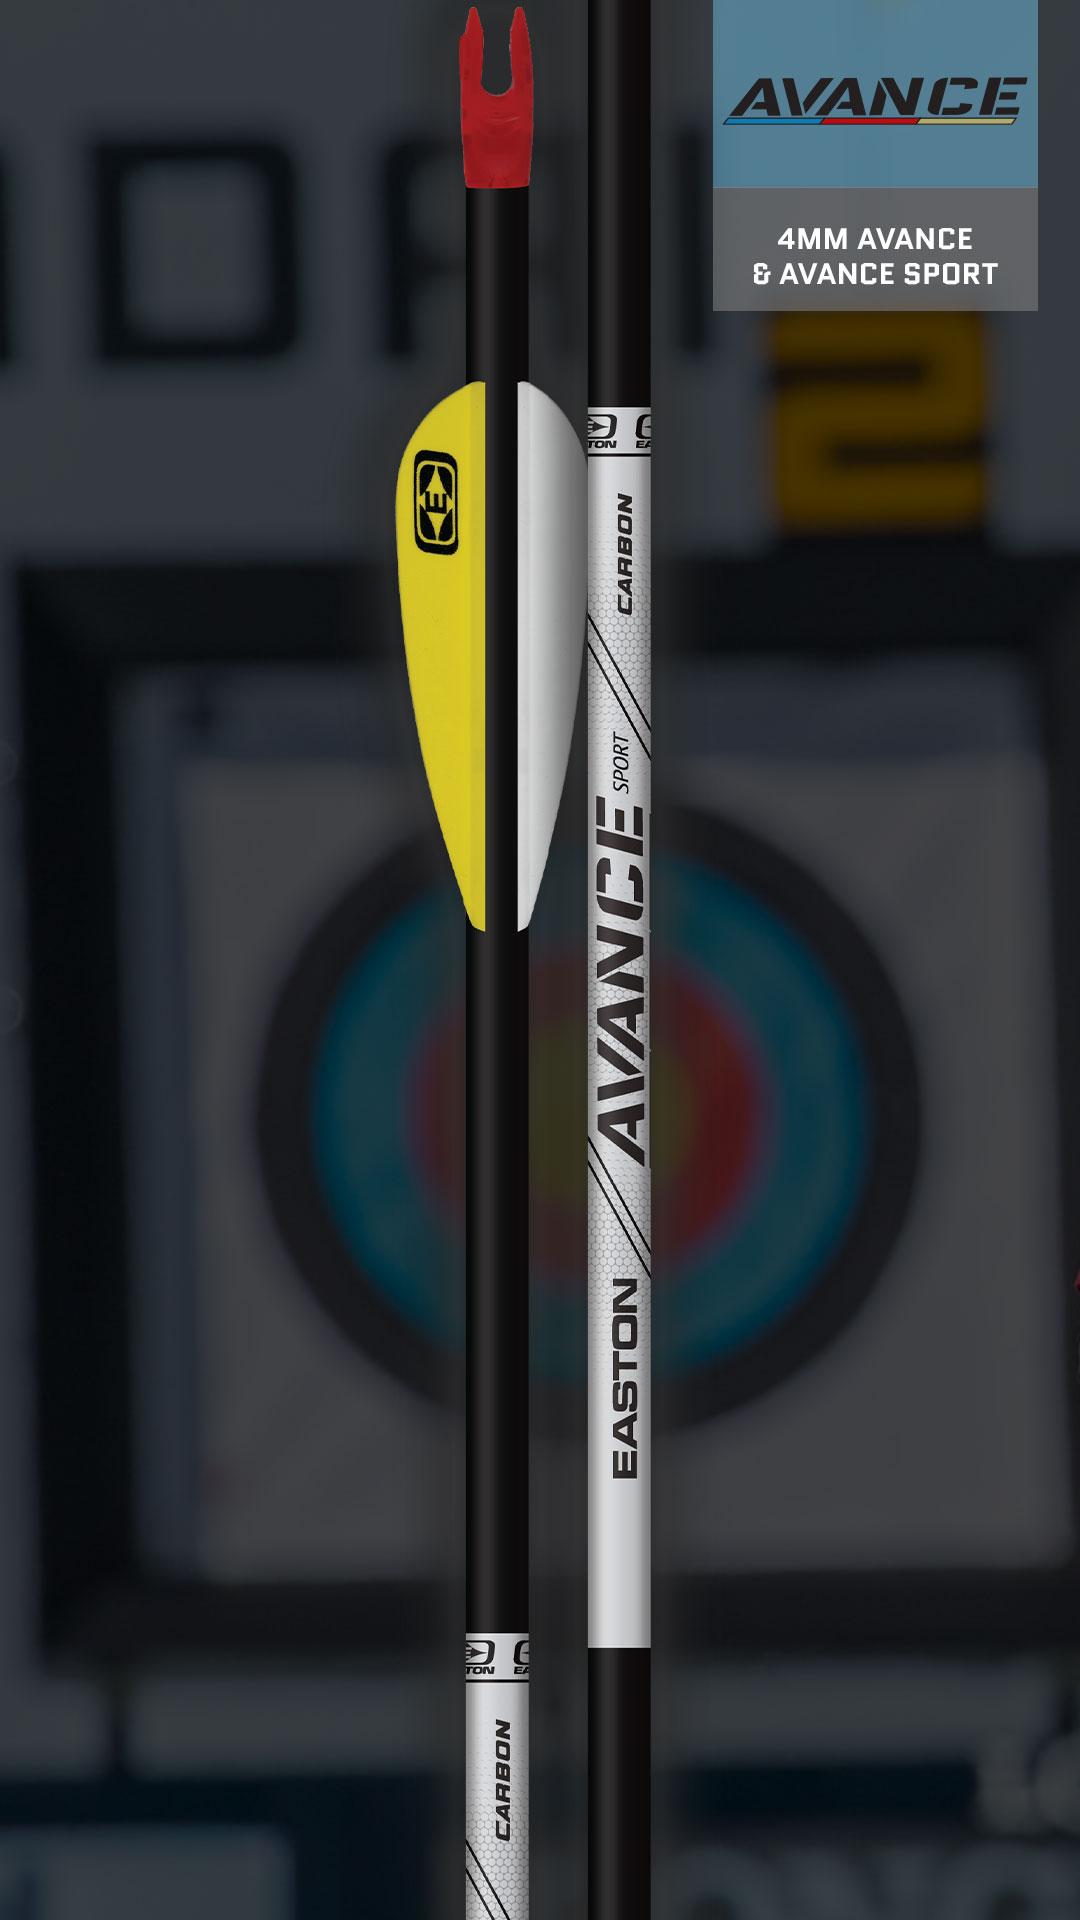 4mm Avance Target Arrows